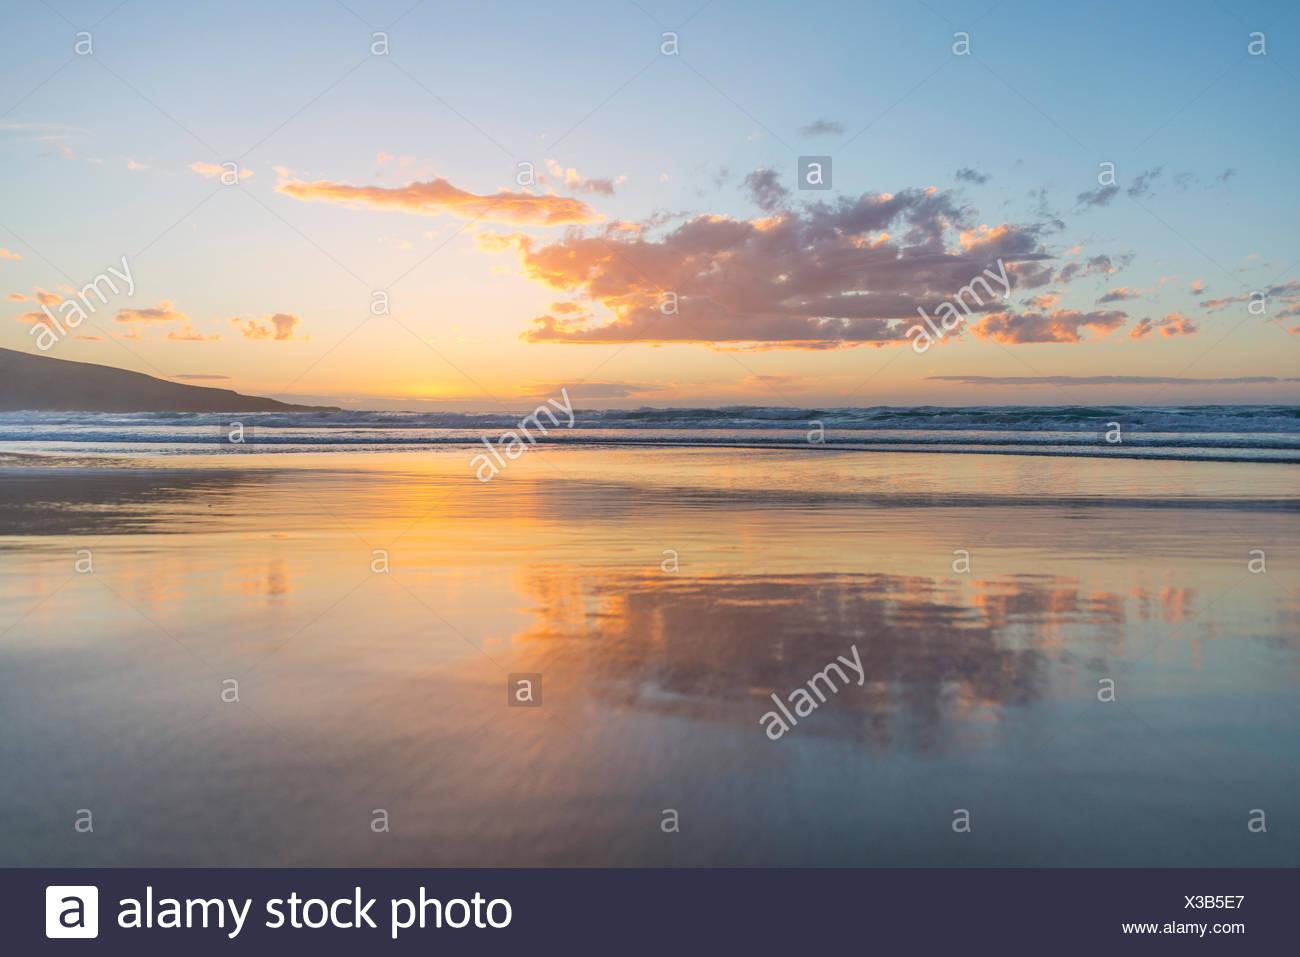 Reflection, sunset over the sea, Sandfly Bay, Dunedin, Otago, South Island, New Zealand - Stock Image